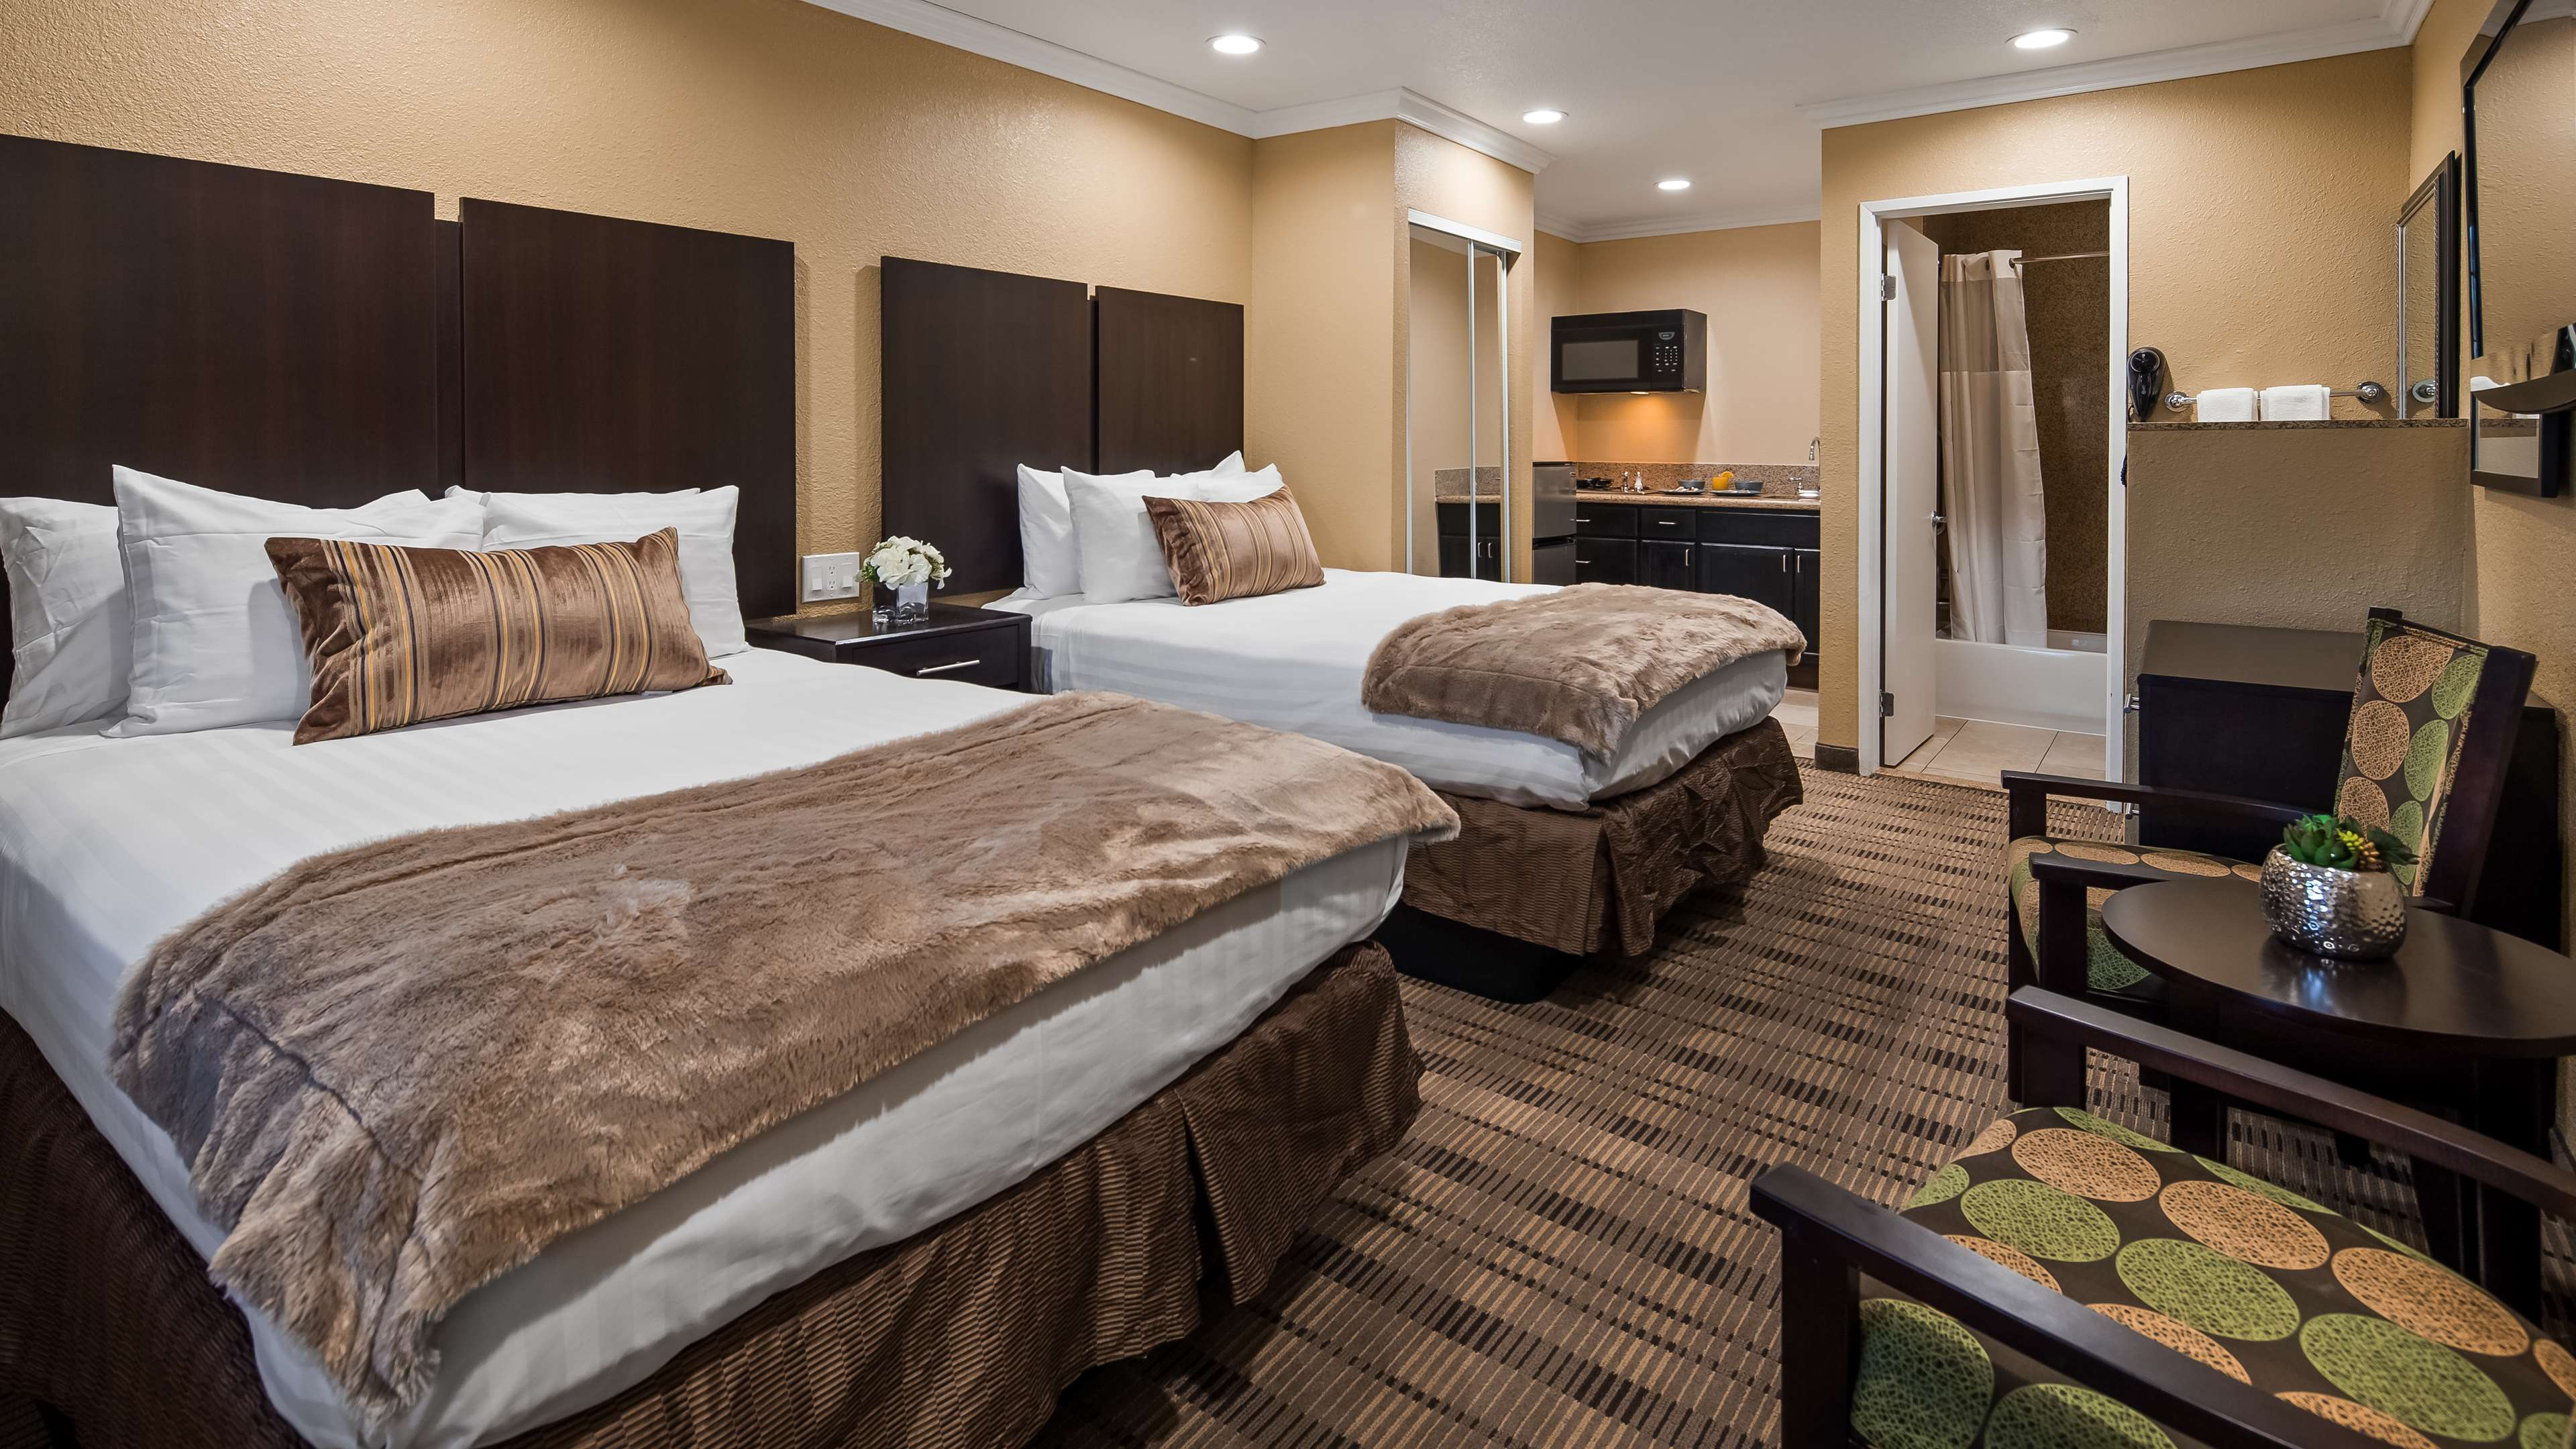 Best Western Poway/San Diego Hotel image 6